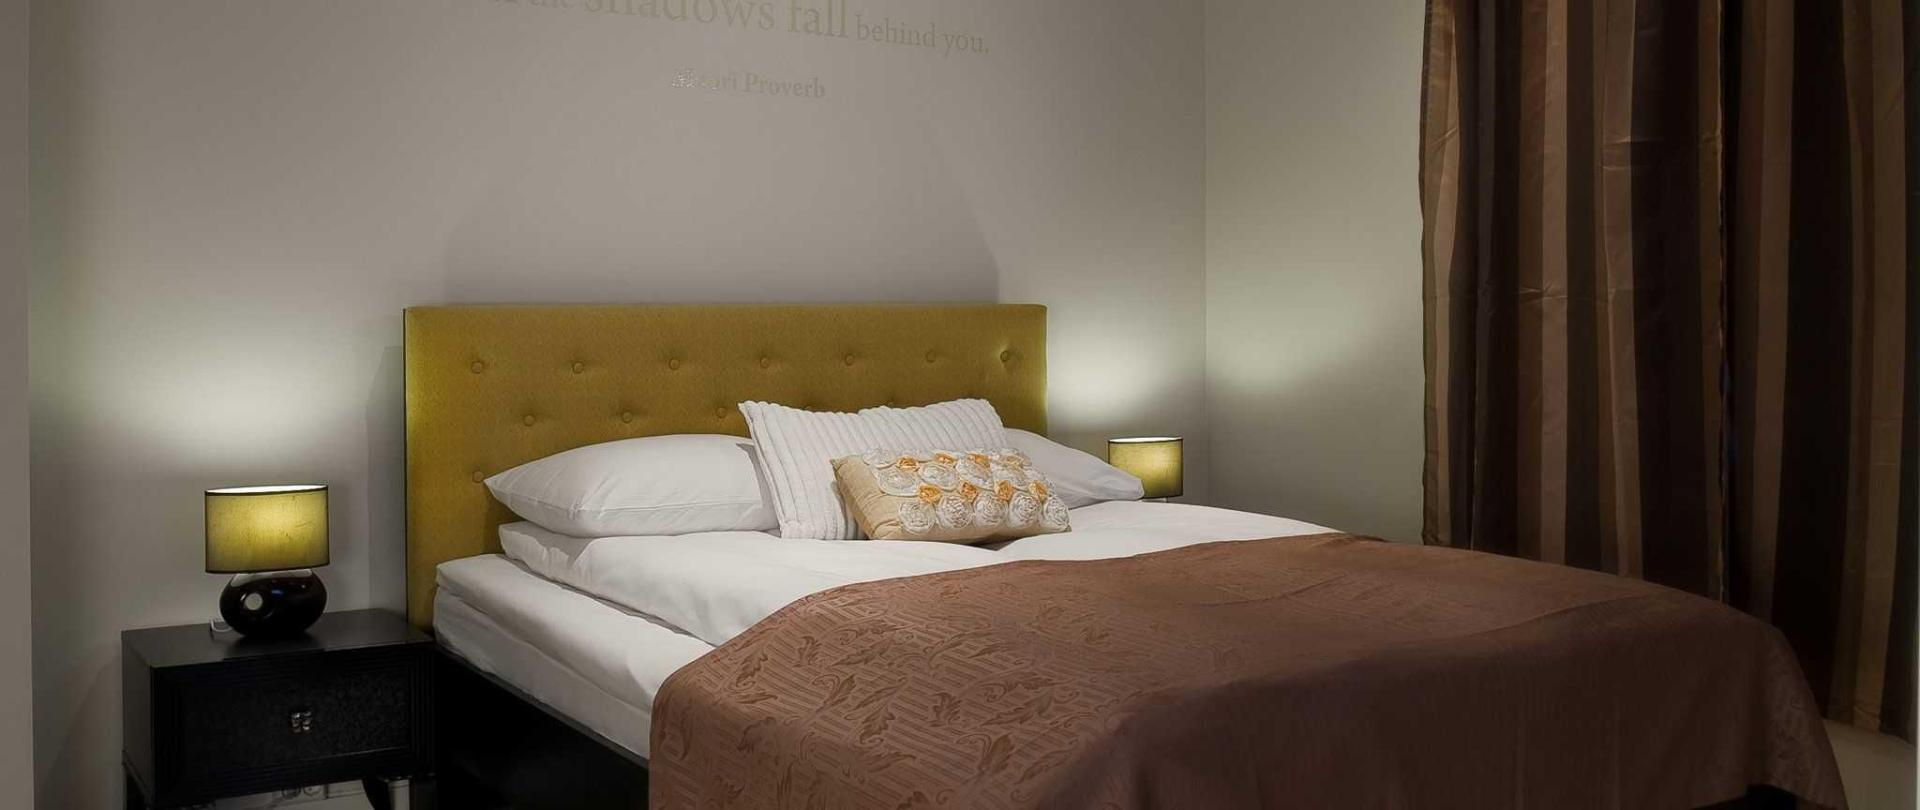 basic-hotel-bergen-002-2.jpg